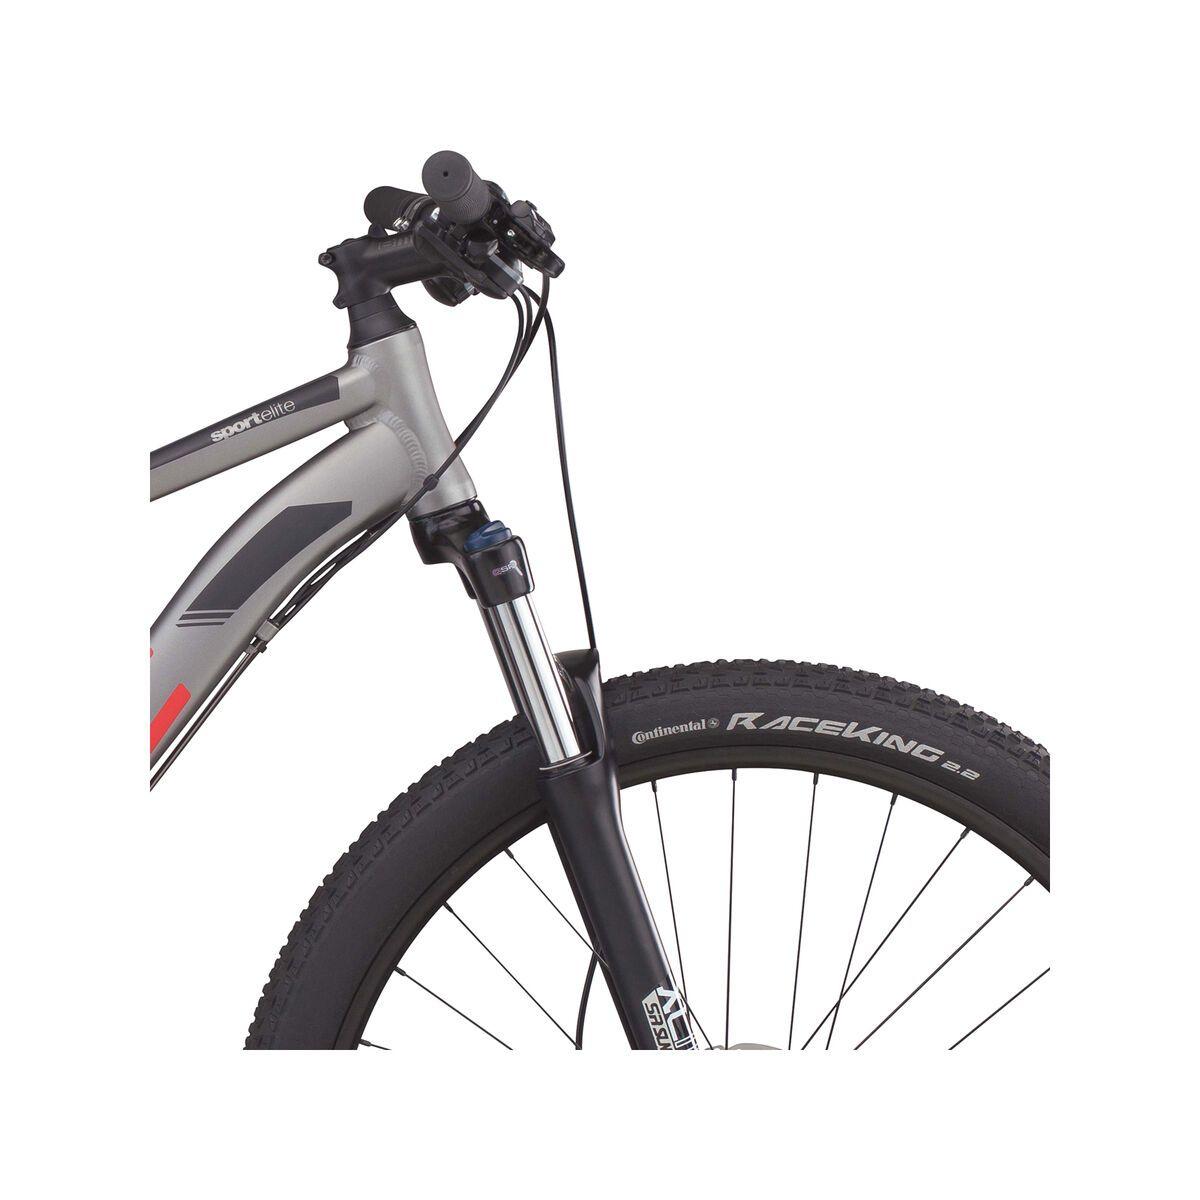 BMC Sportelite SE Alivio, grey | Bild 5